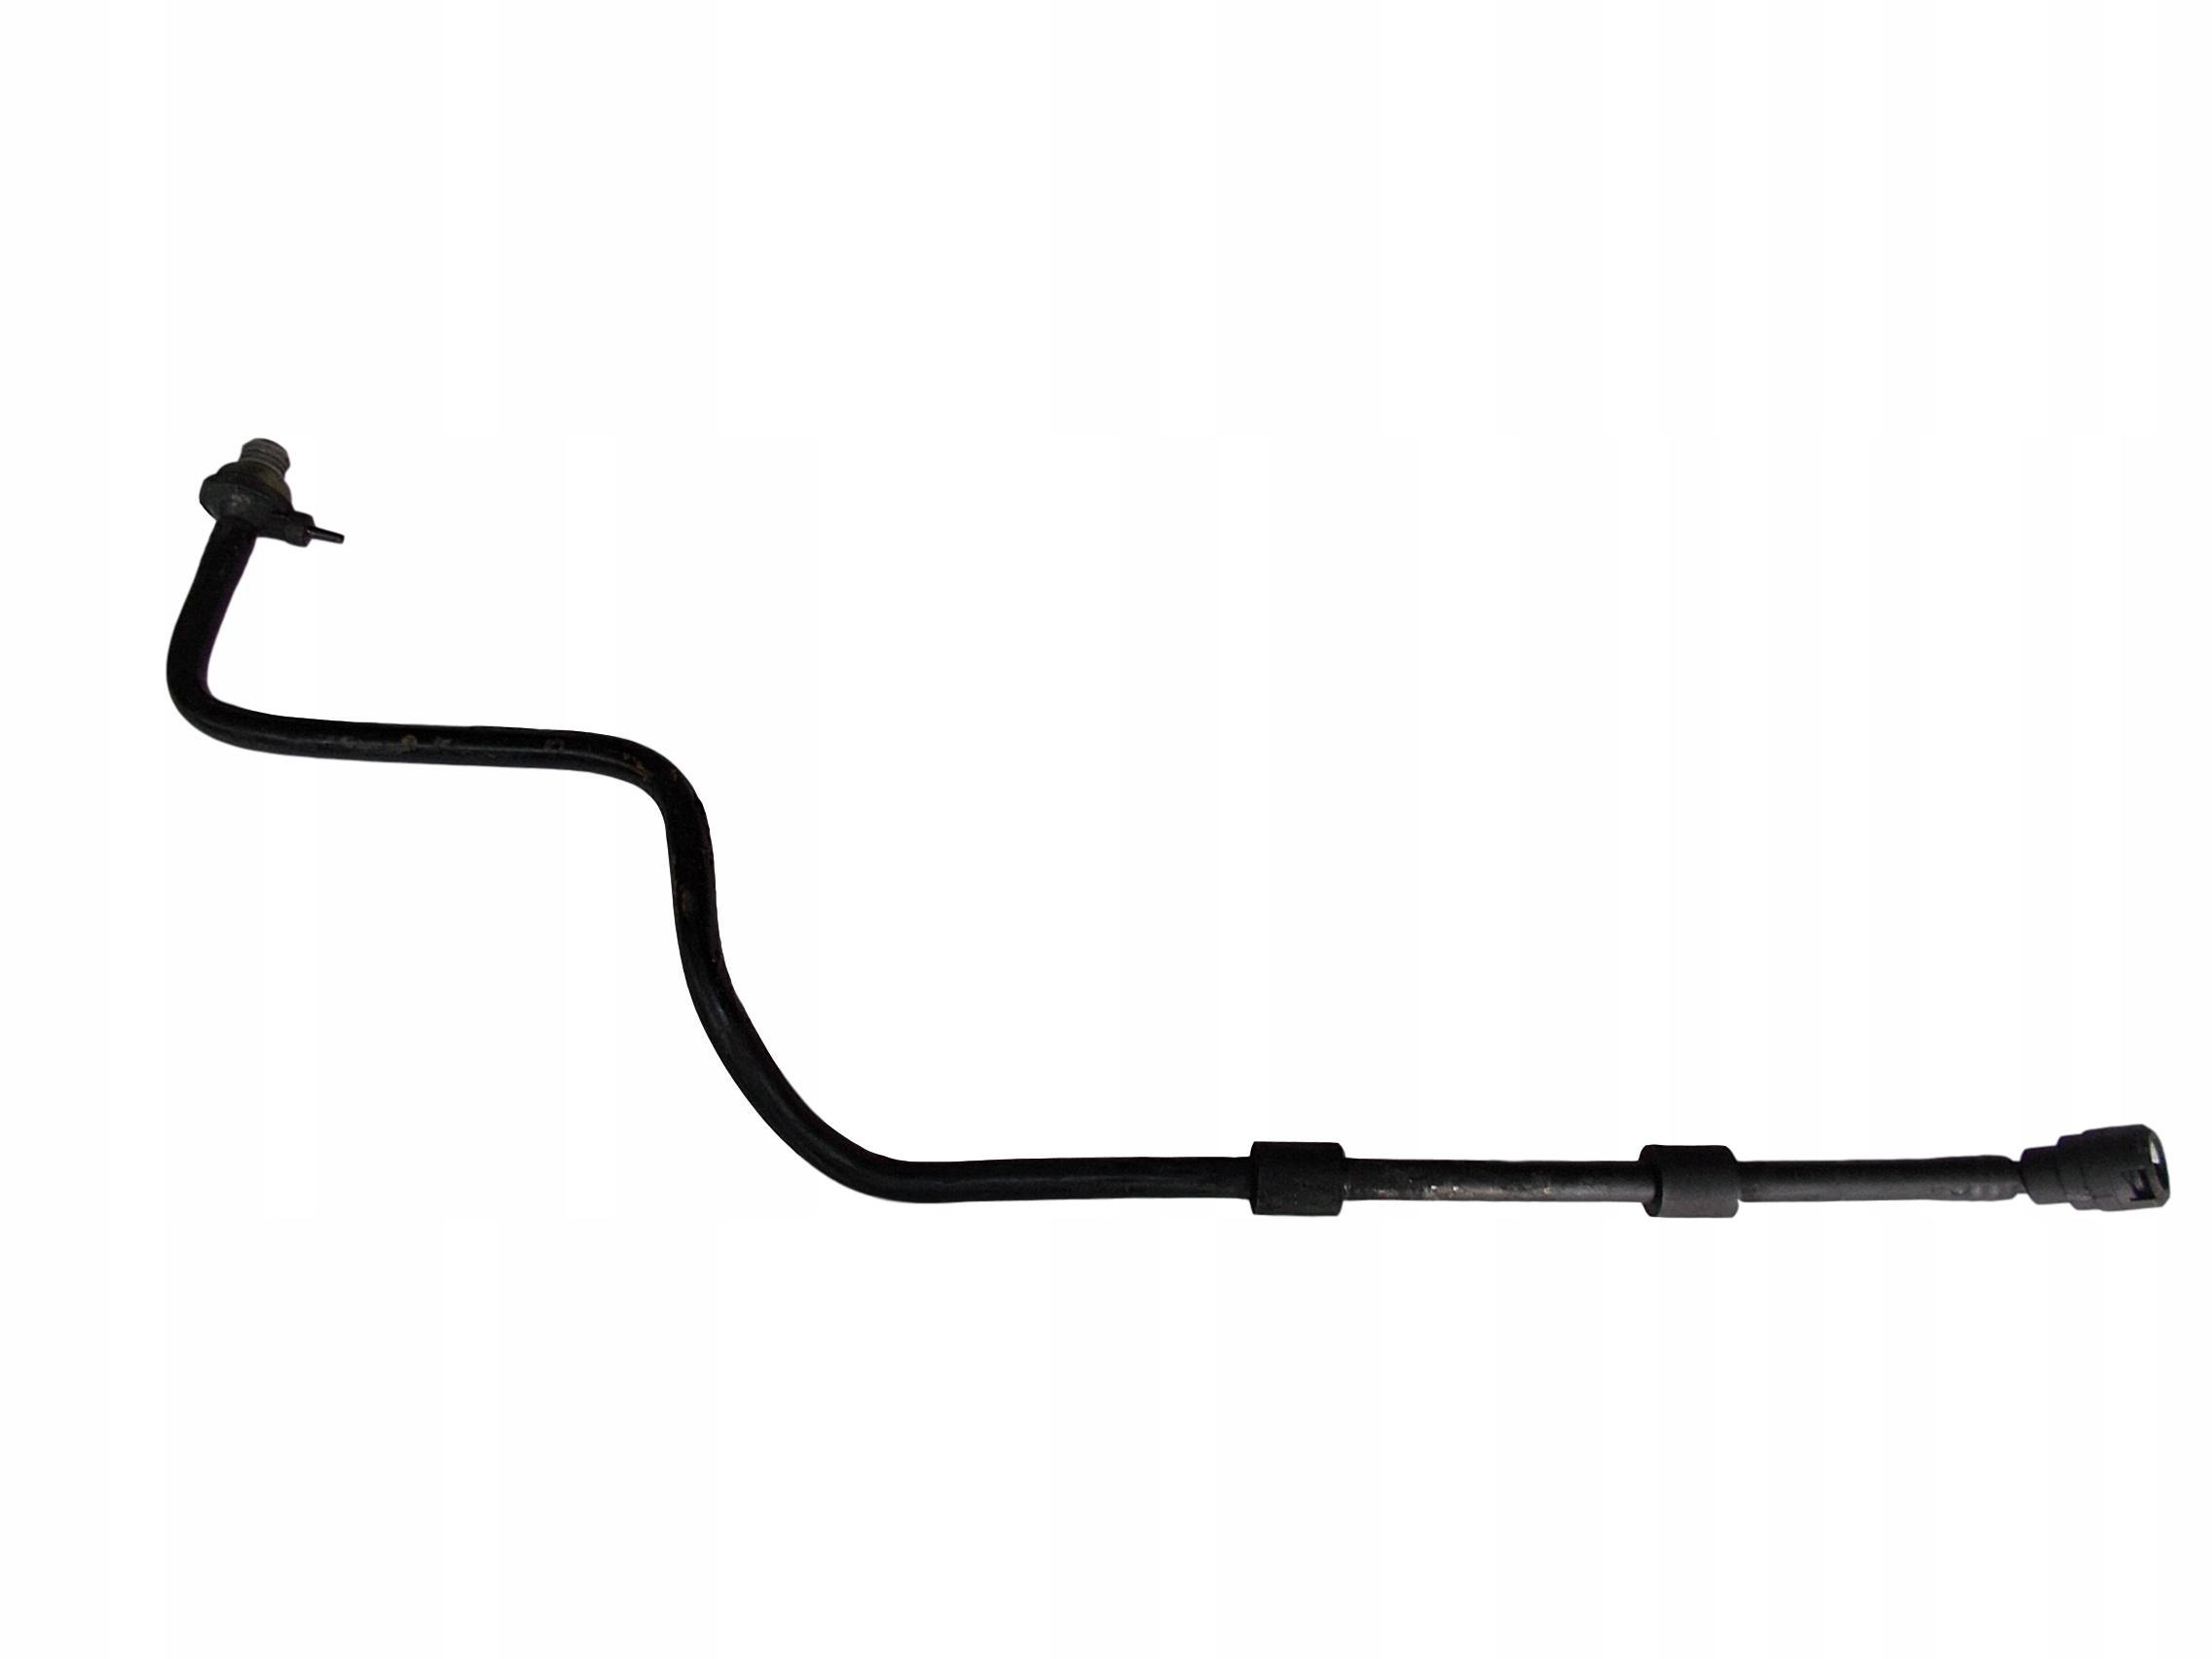 кабель серво  шланг серво  mercedes sprinter  00-06